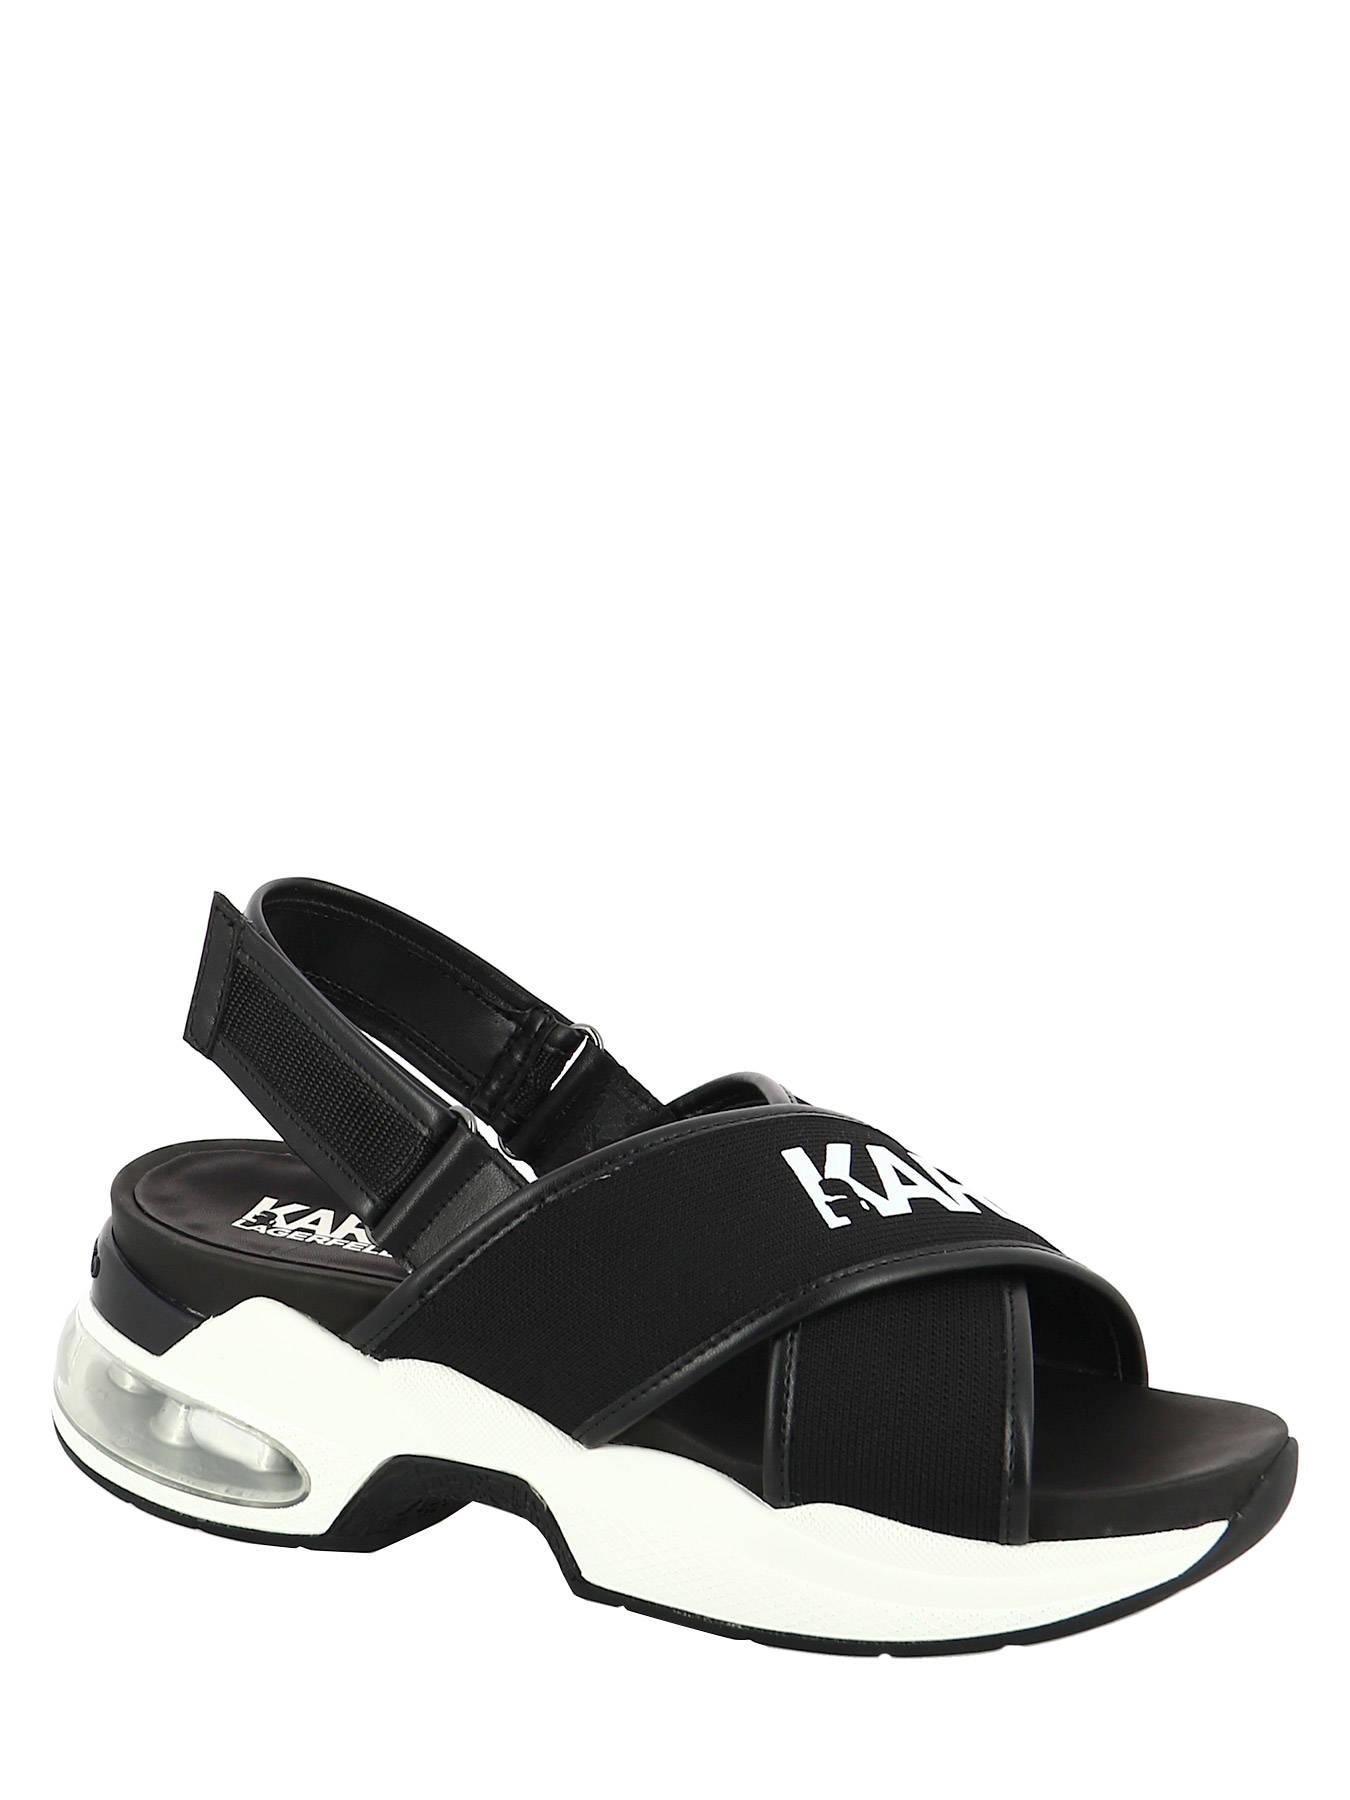 Karl Lagerfeld Sandals/flip-flops